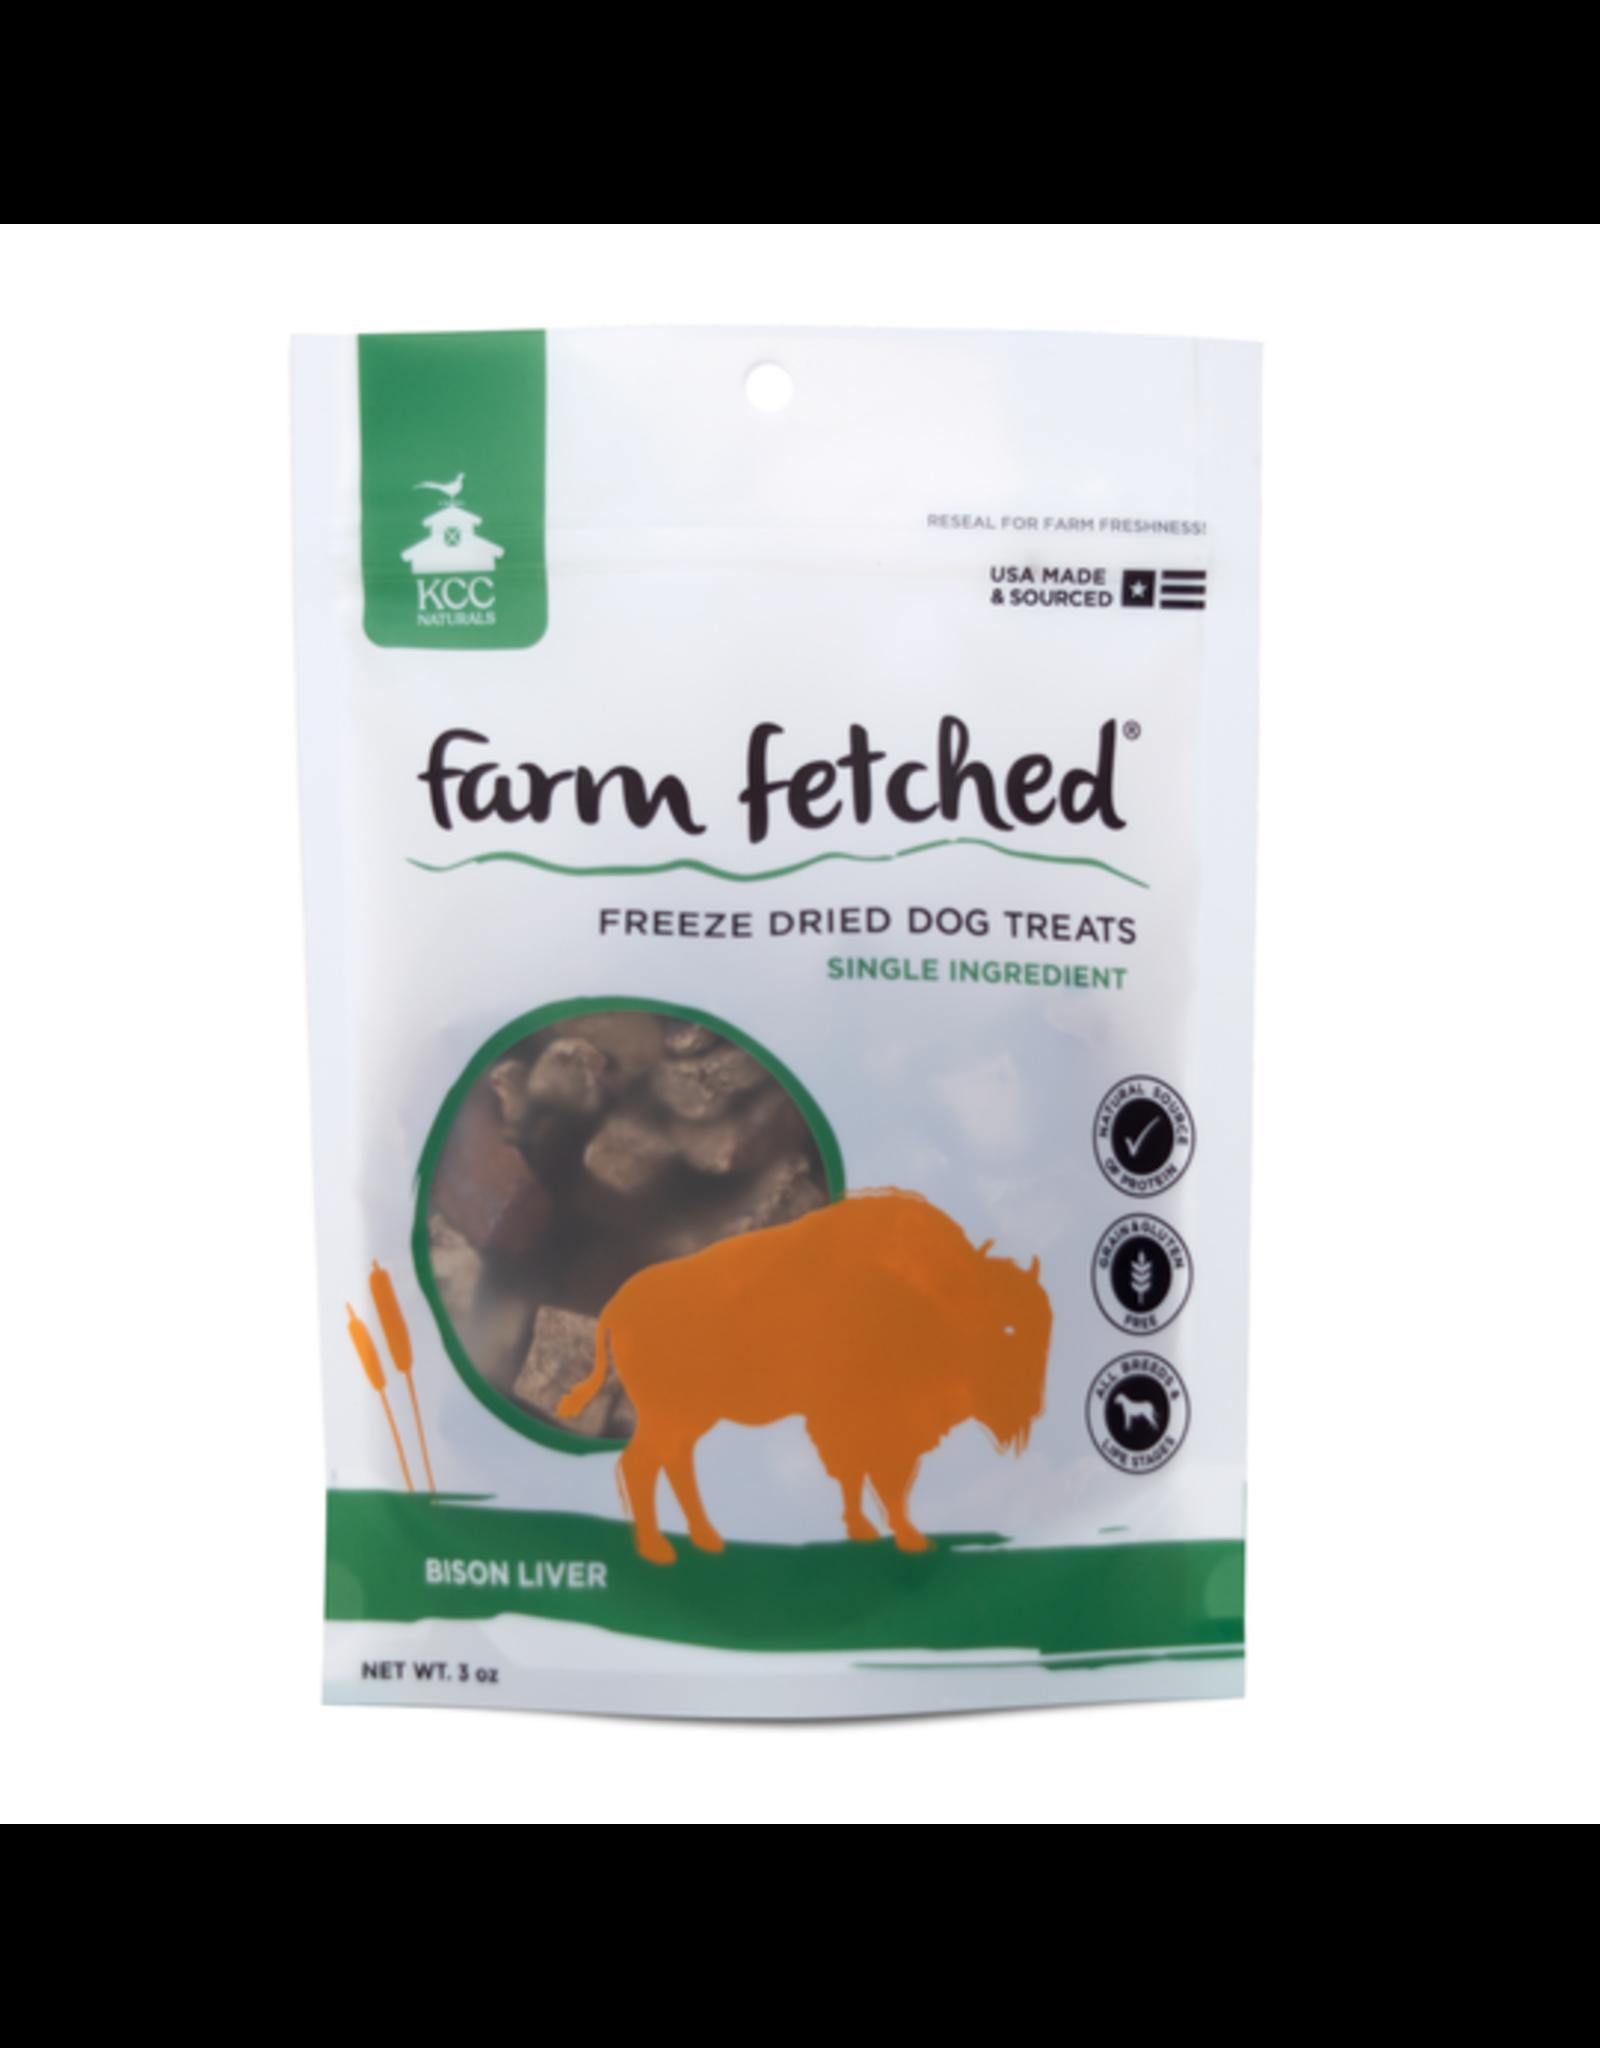 KCC KCC Naturals Farm Fetched Freeze Dried Bison Liver Dog Treat 3oz